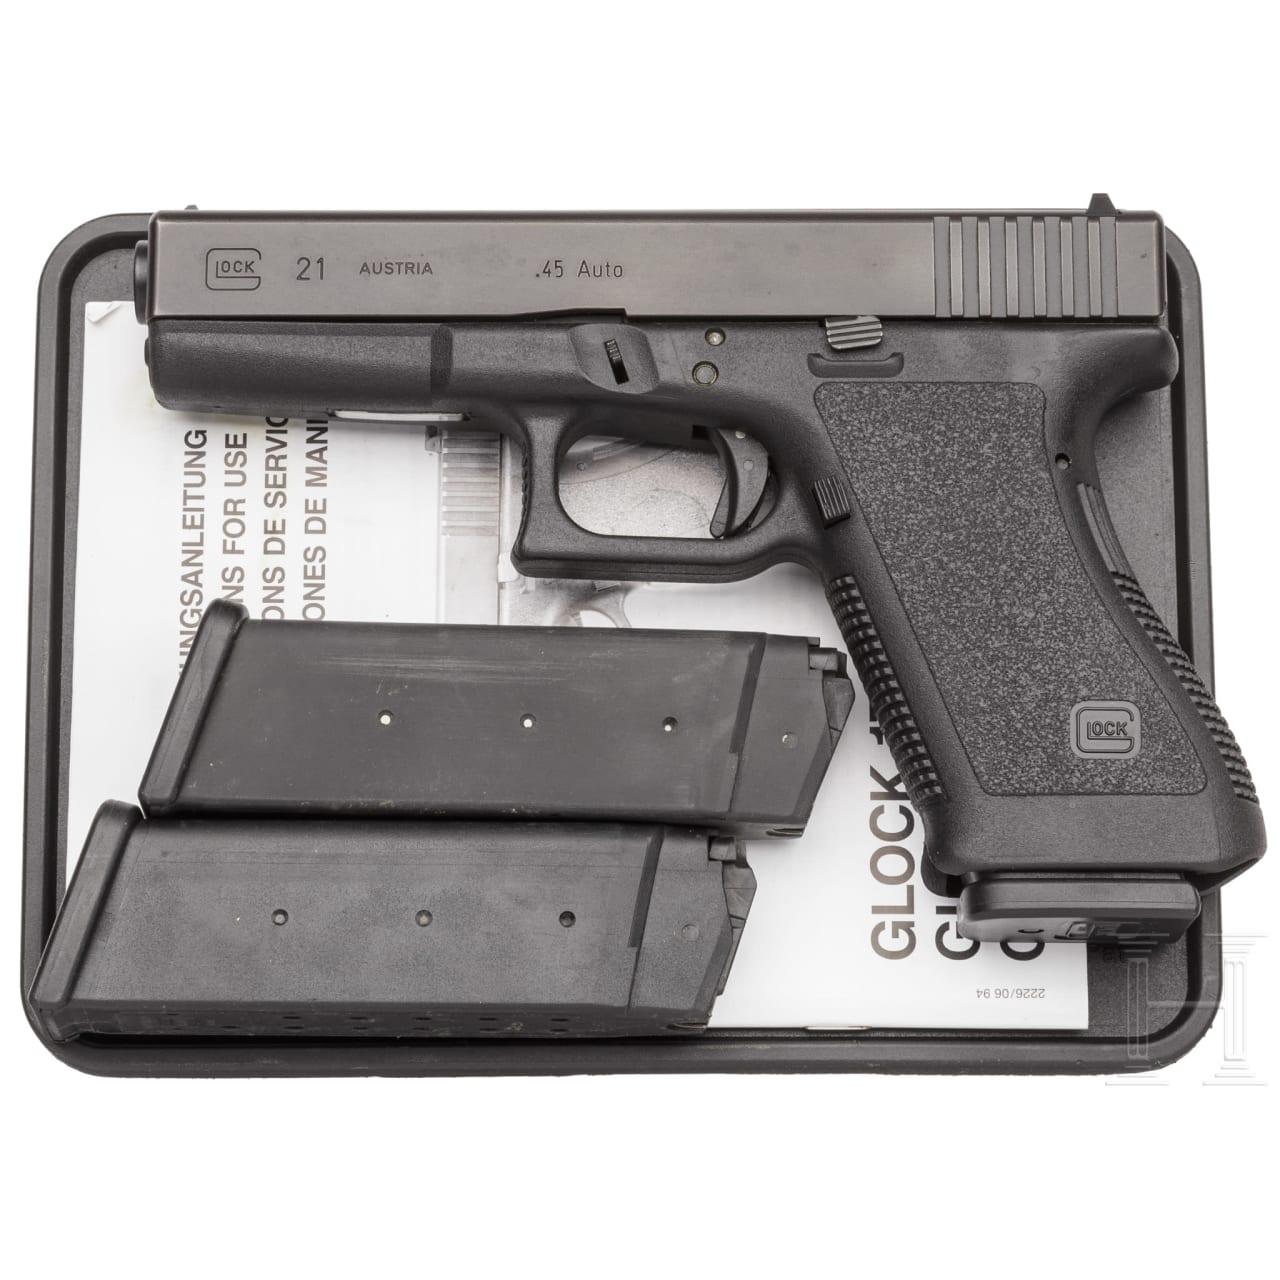 Glock Mod. 21, in Box